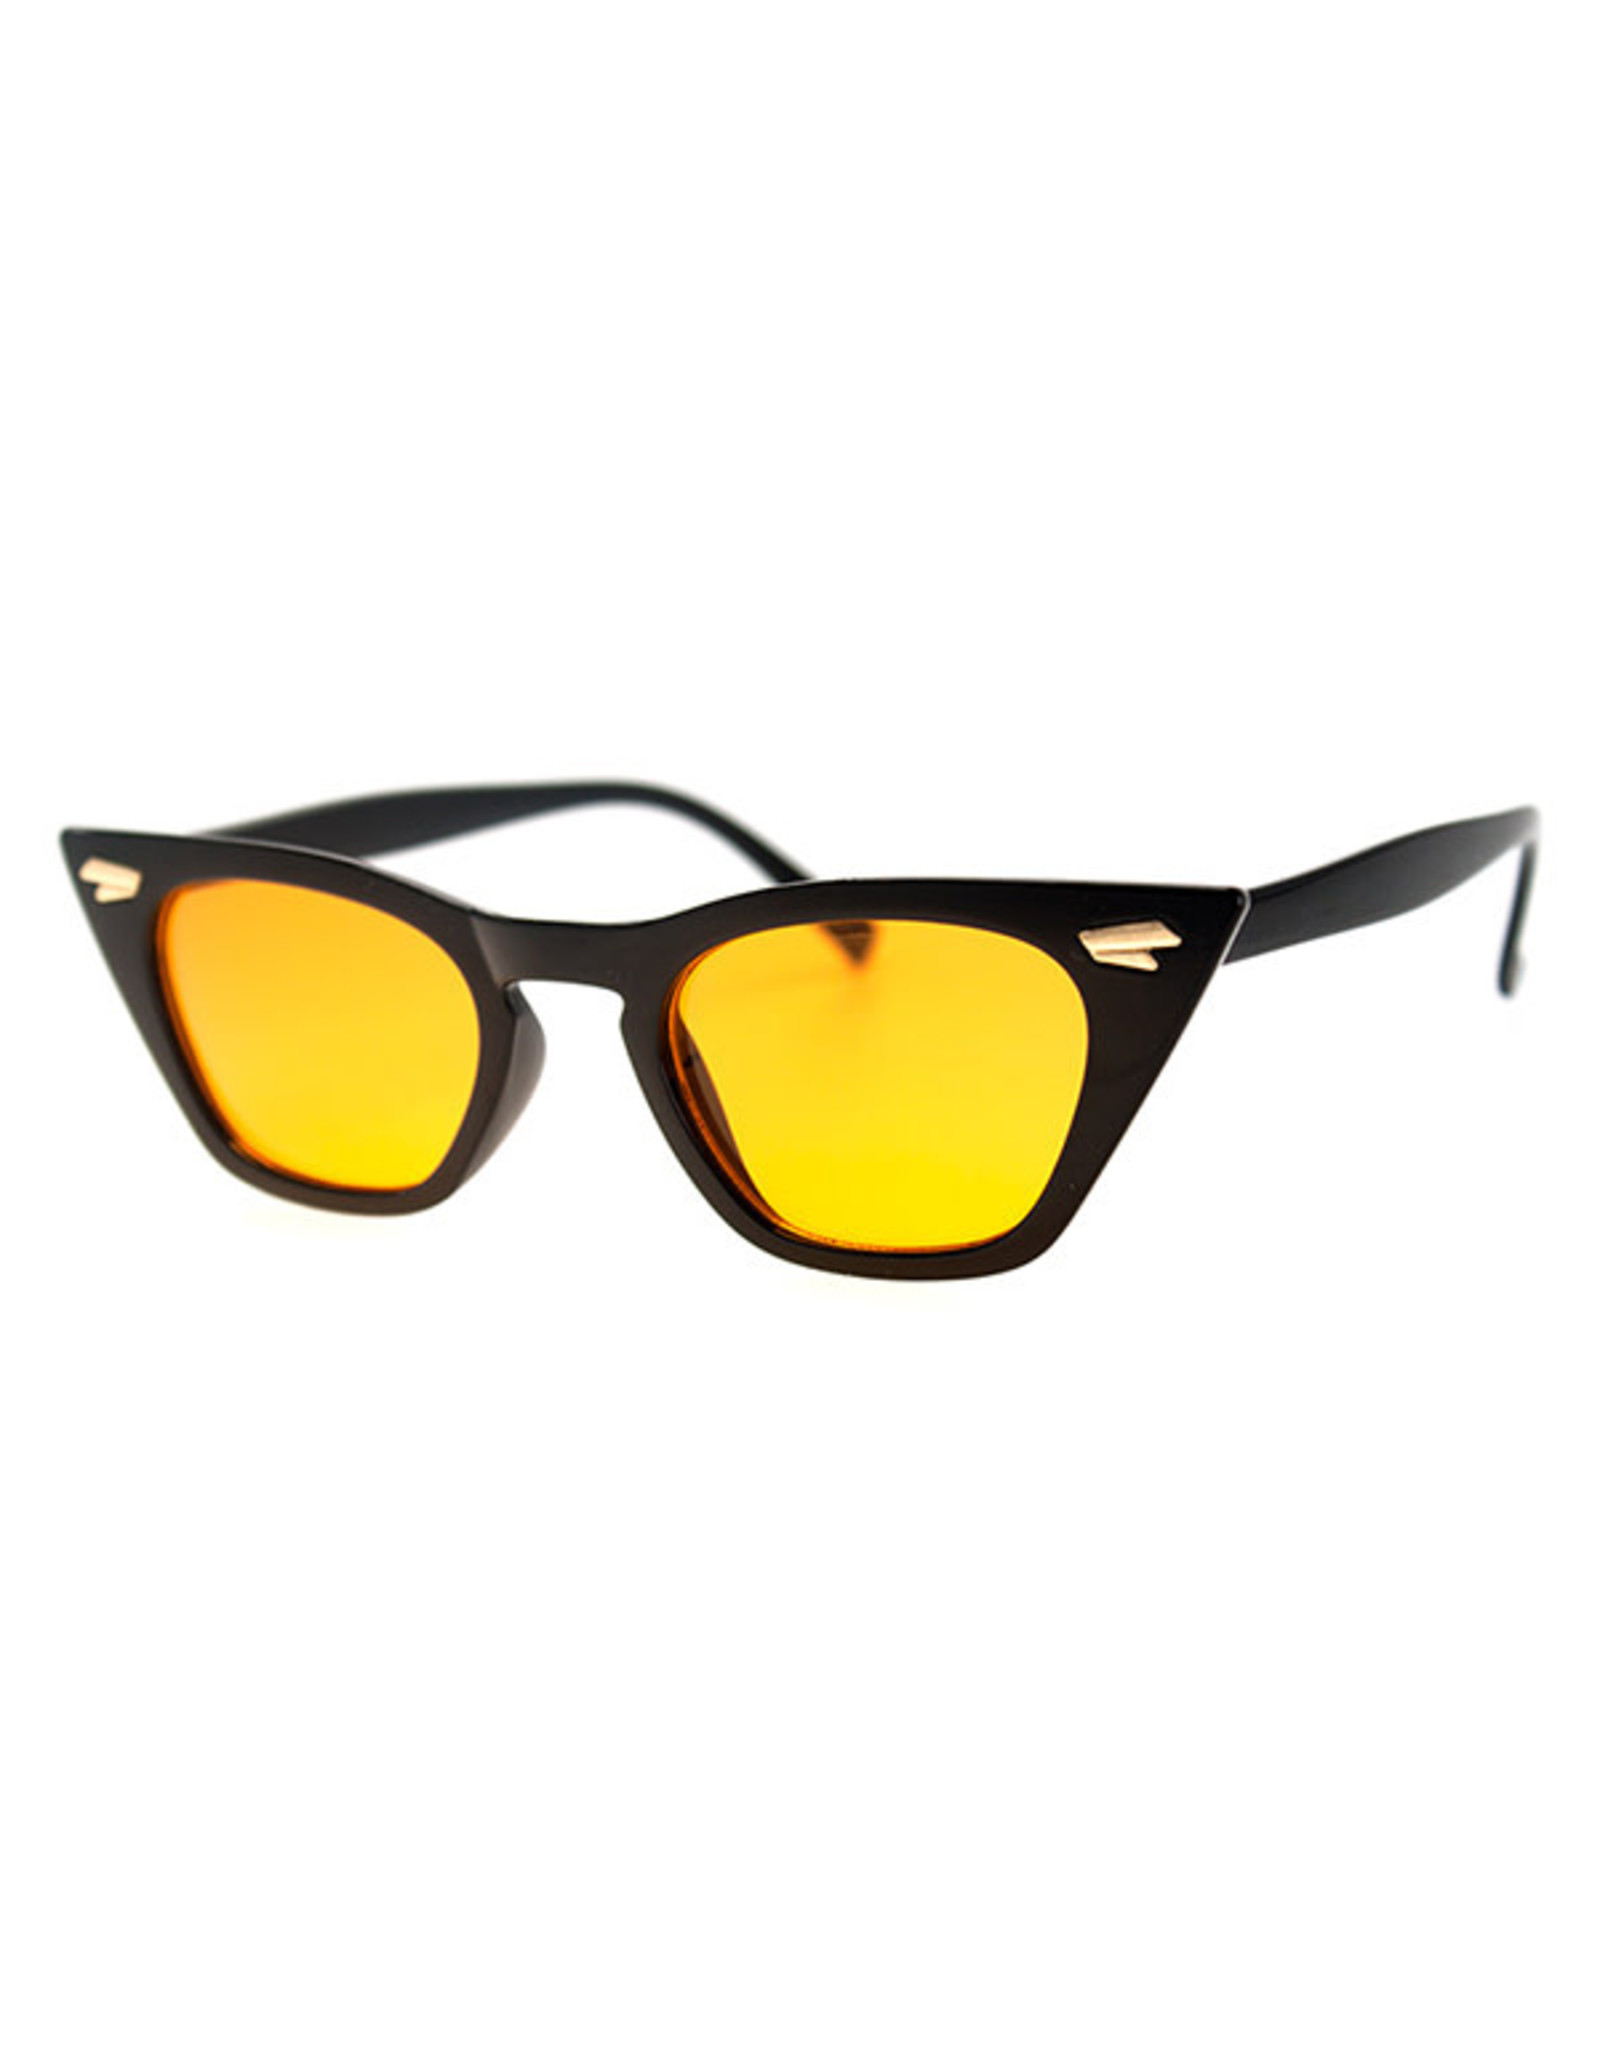 AJ Morgan AJM - Skinny Cat-eye Frame Sunglasses Black